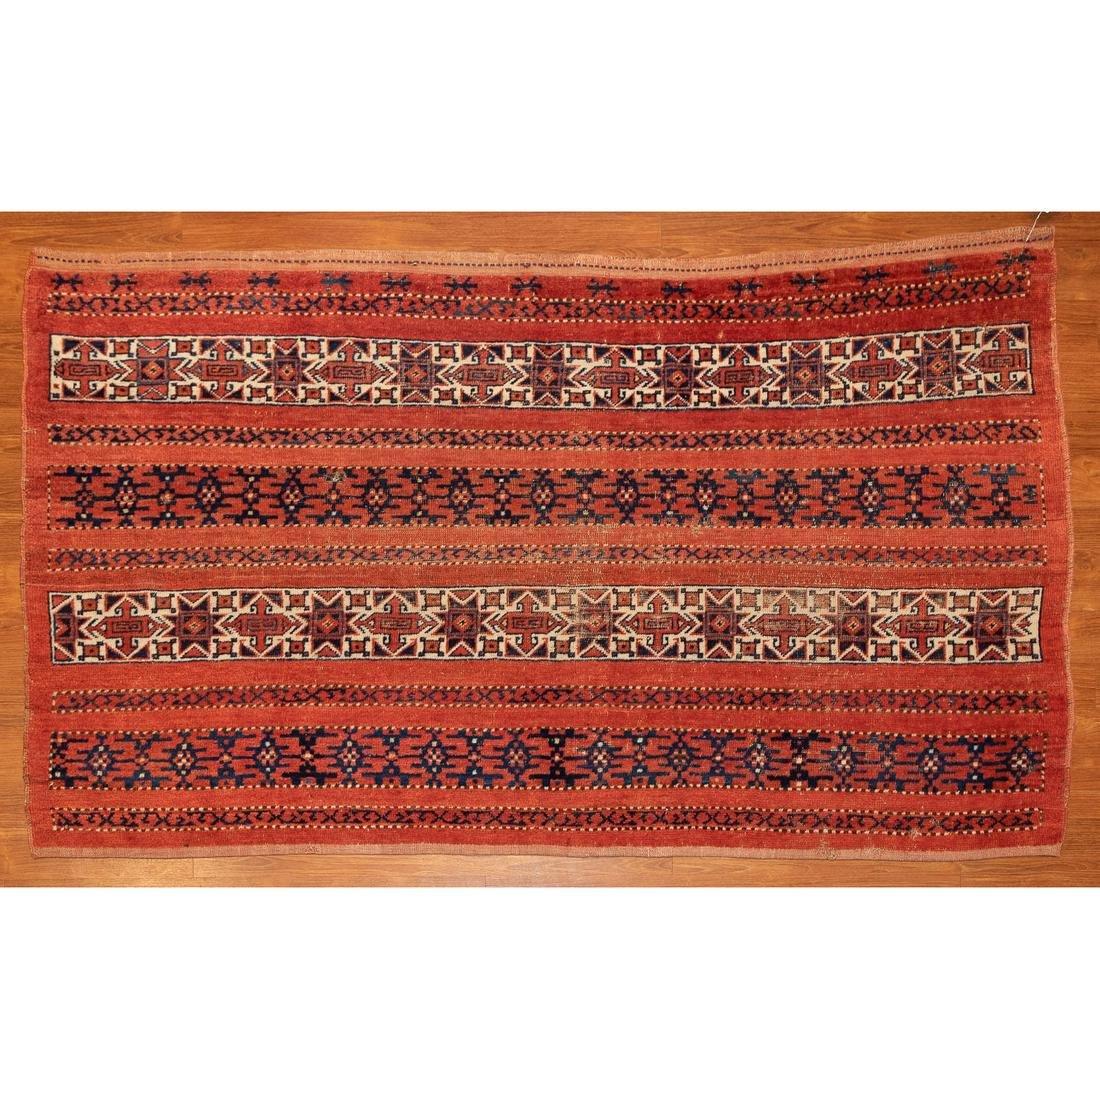 Turkeman Rug, Turkestan, 4 x 6.5